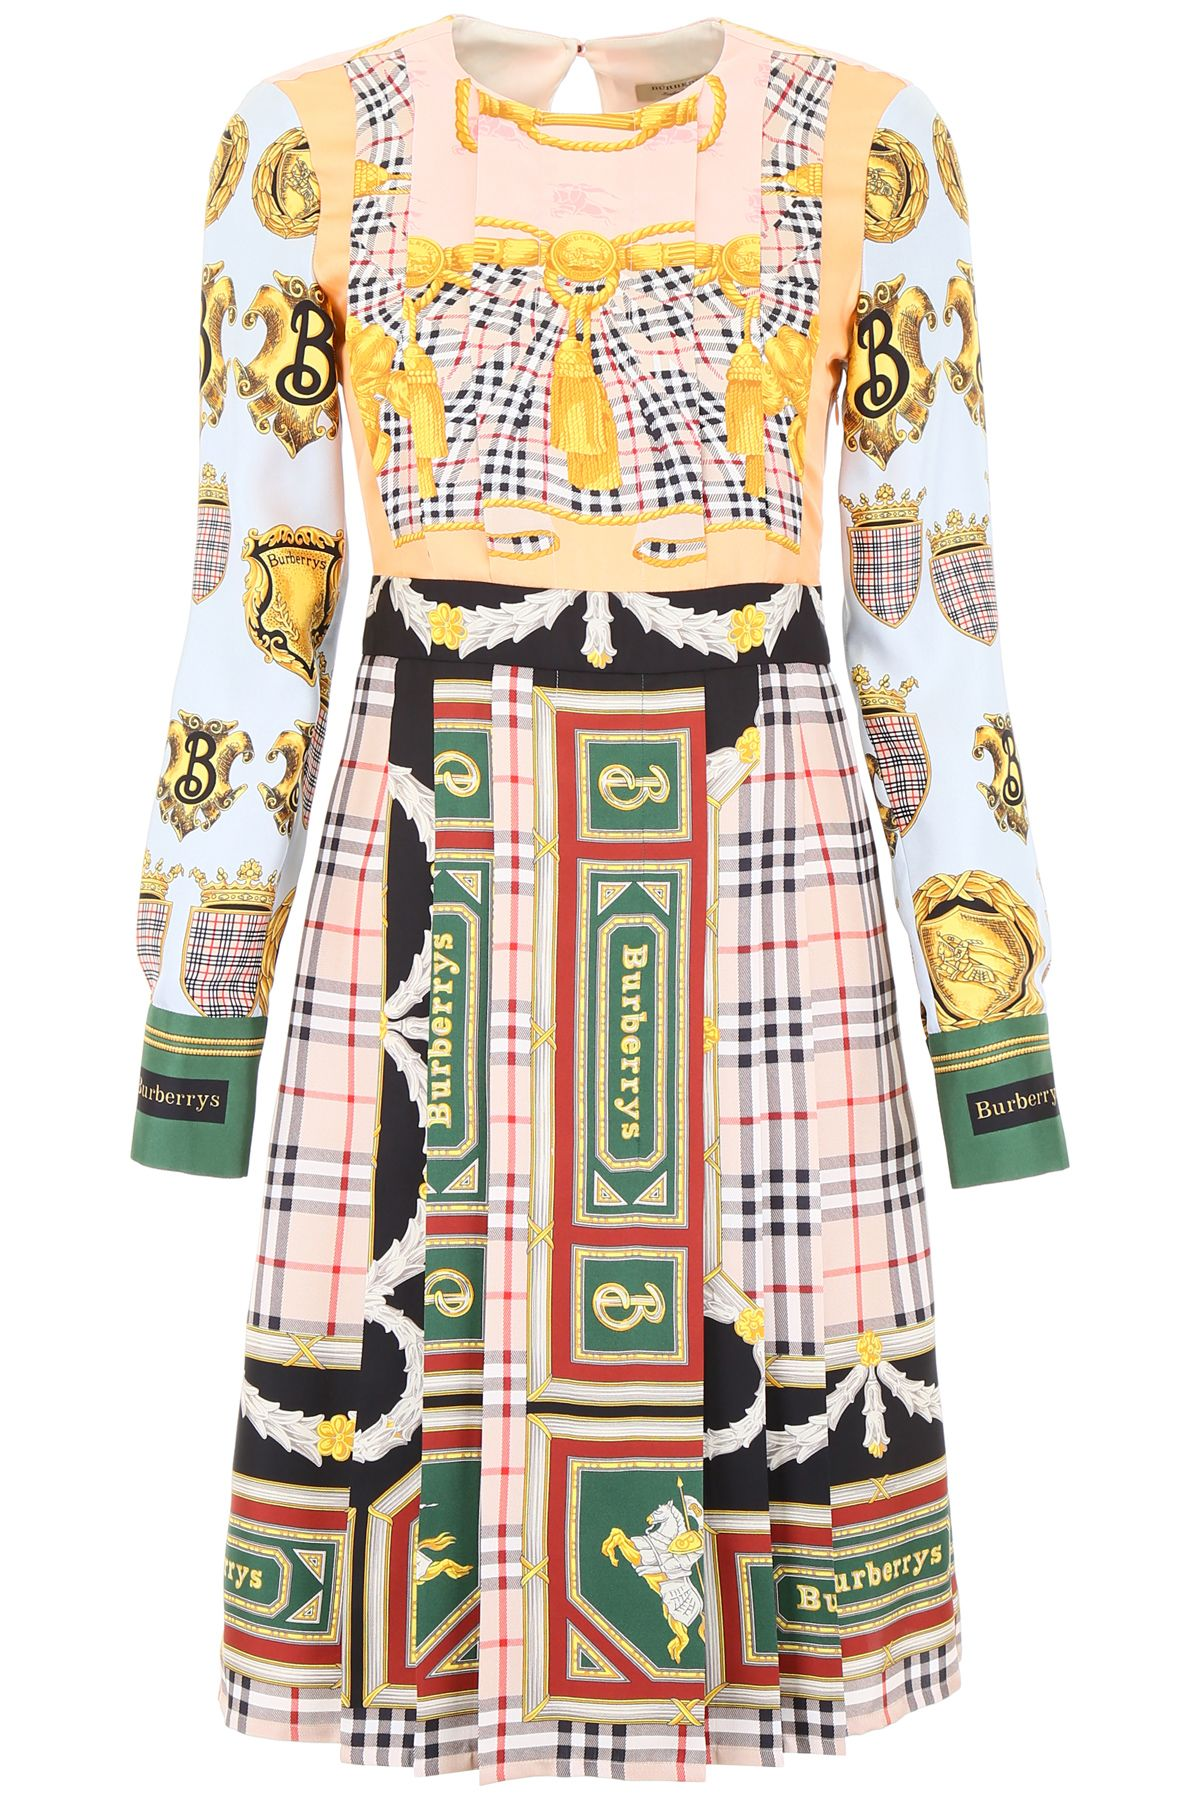 BURBERRY LOGO SILK DRESS